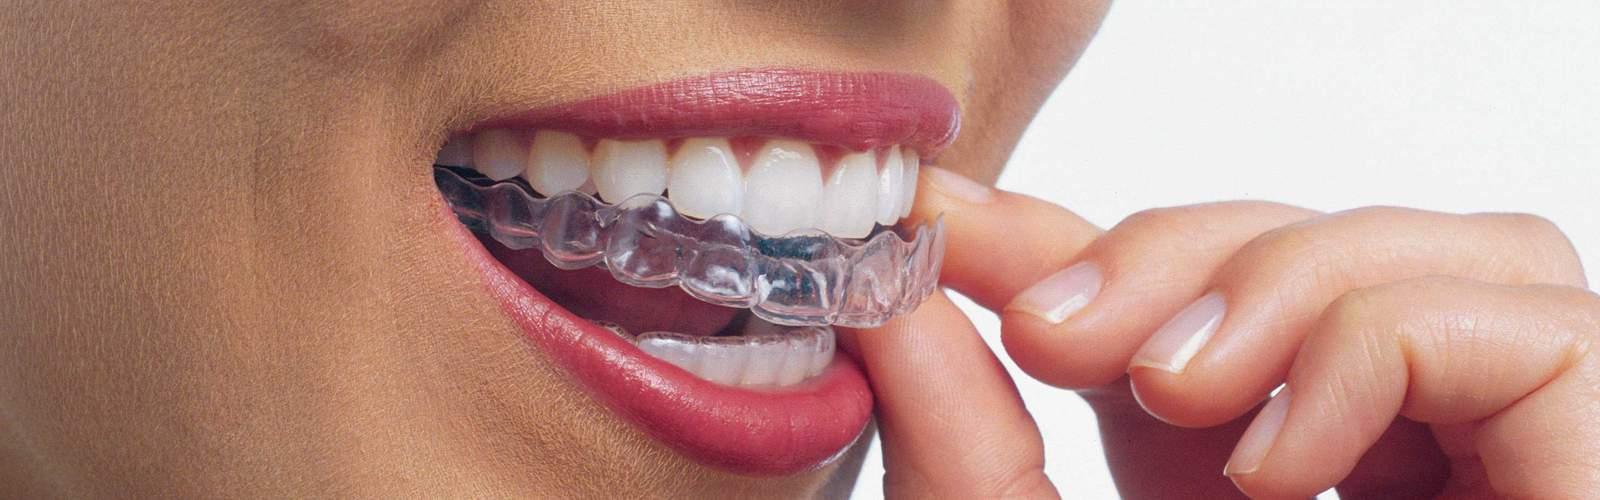 How do you take care of Invisalign braces?